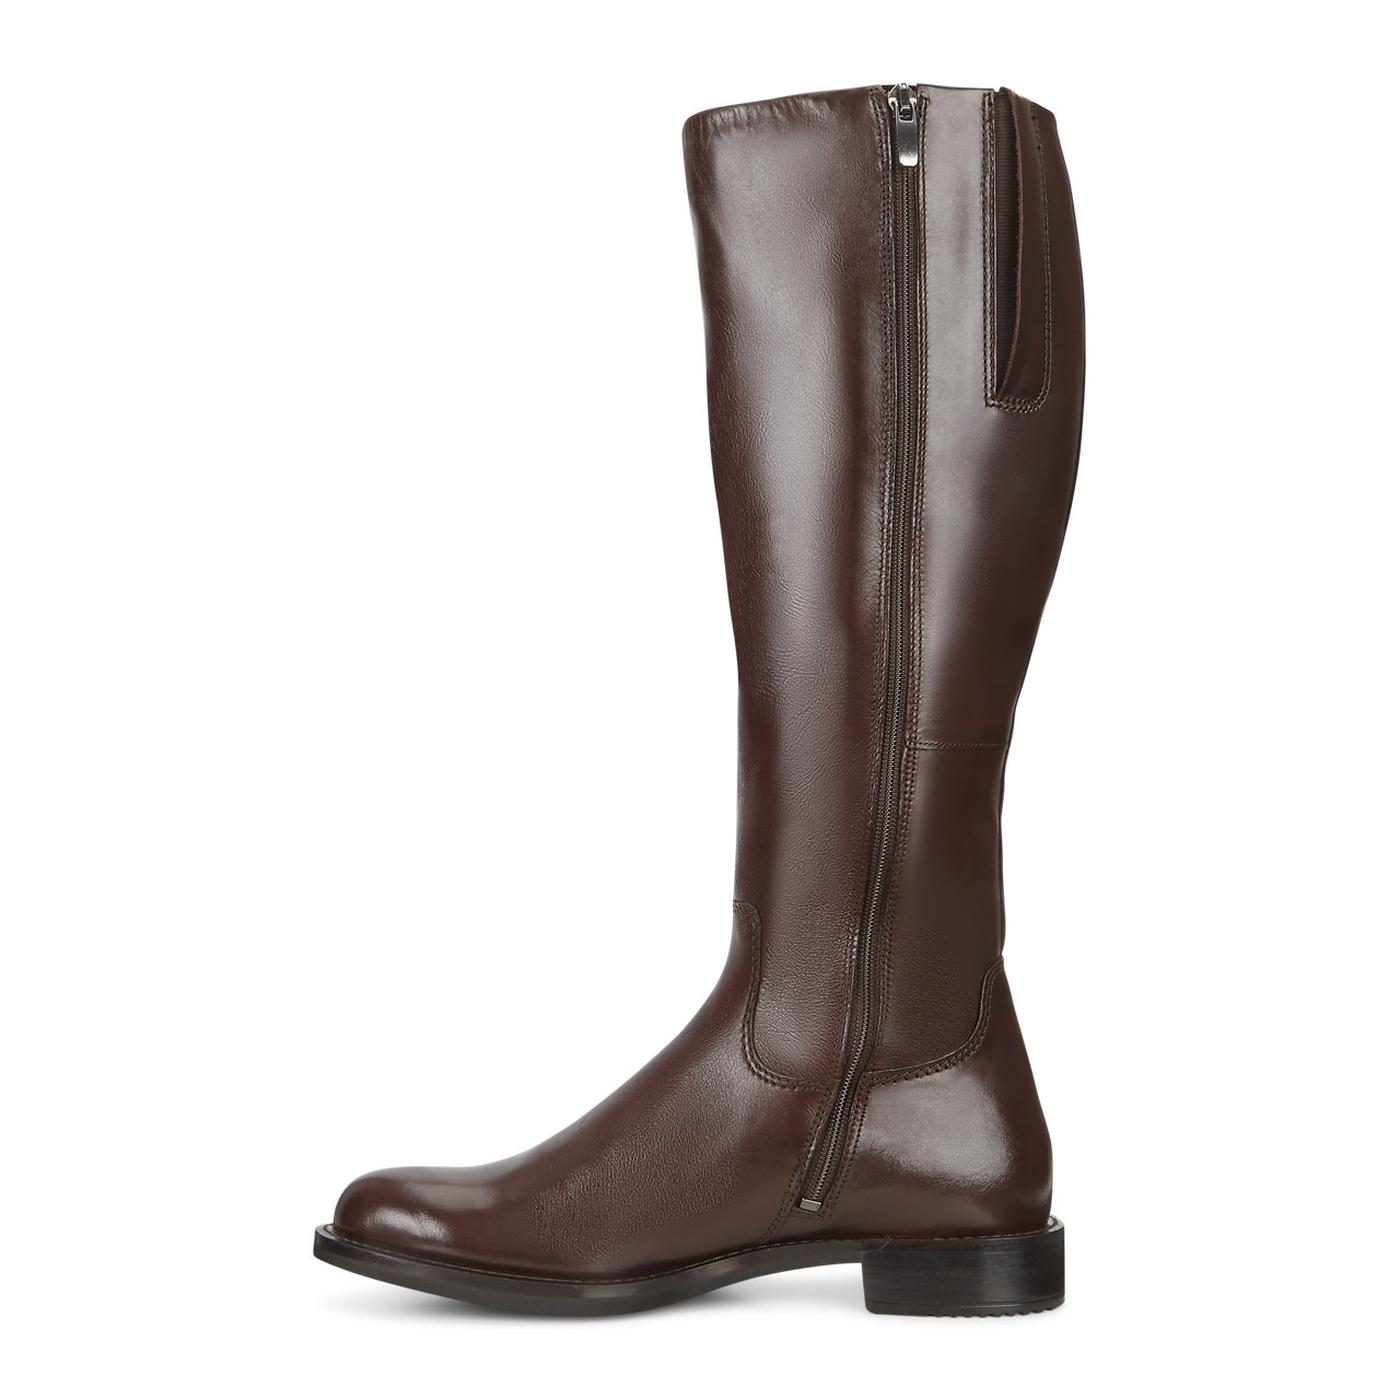 77609b6fb0 ECCO Shape 25 Riding Boot   Women's Formal Boots   ECCO® Shoes